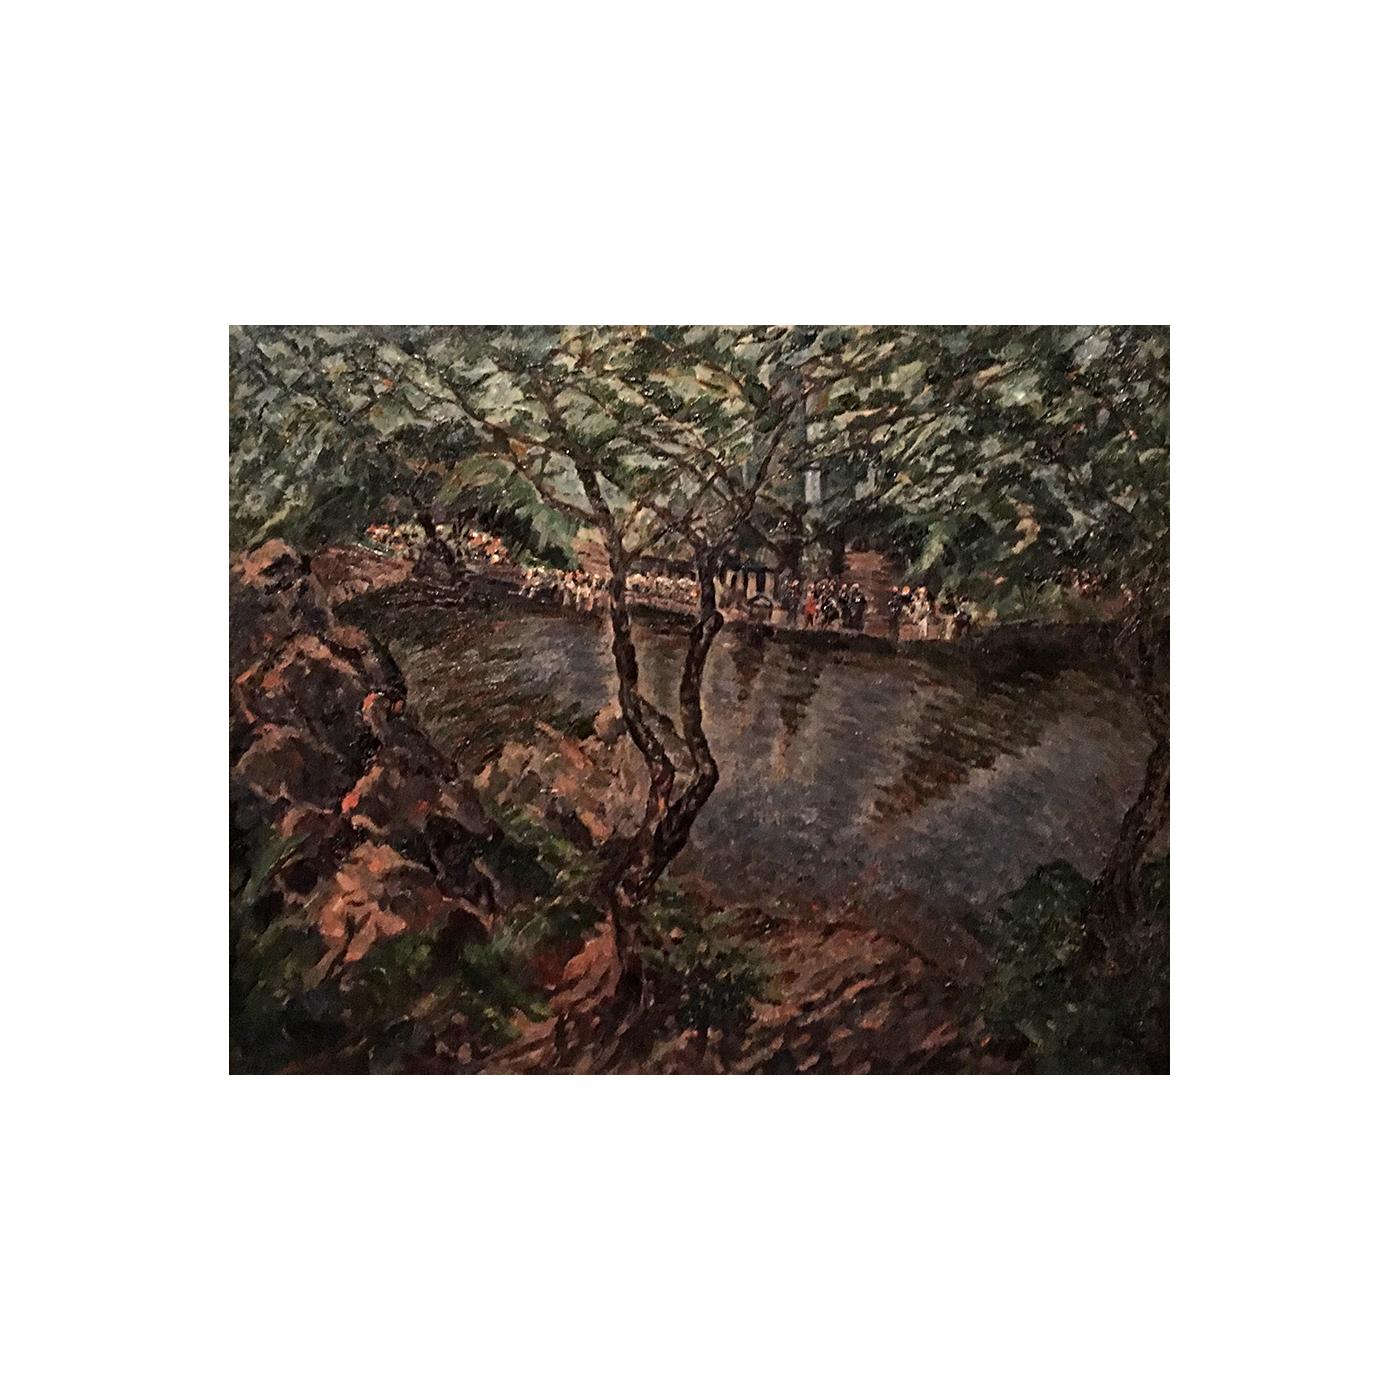 "Arthur Schwieder (1884 - 1965) American painter ""Central Park"" circa 1930"